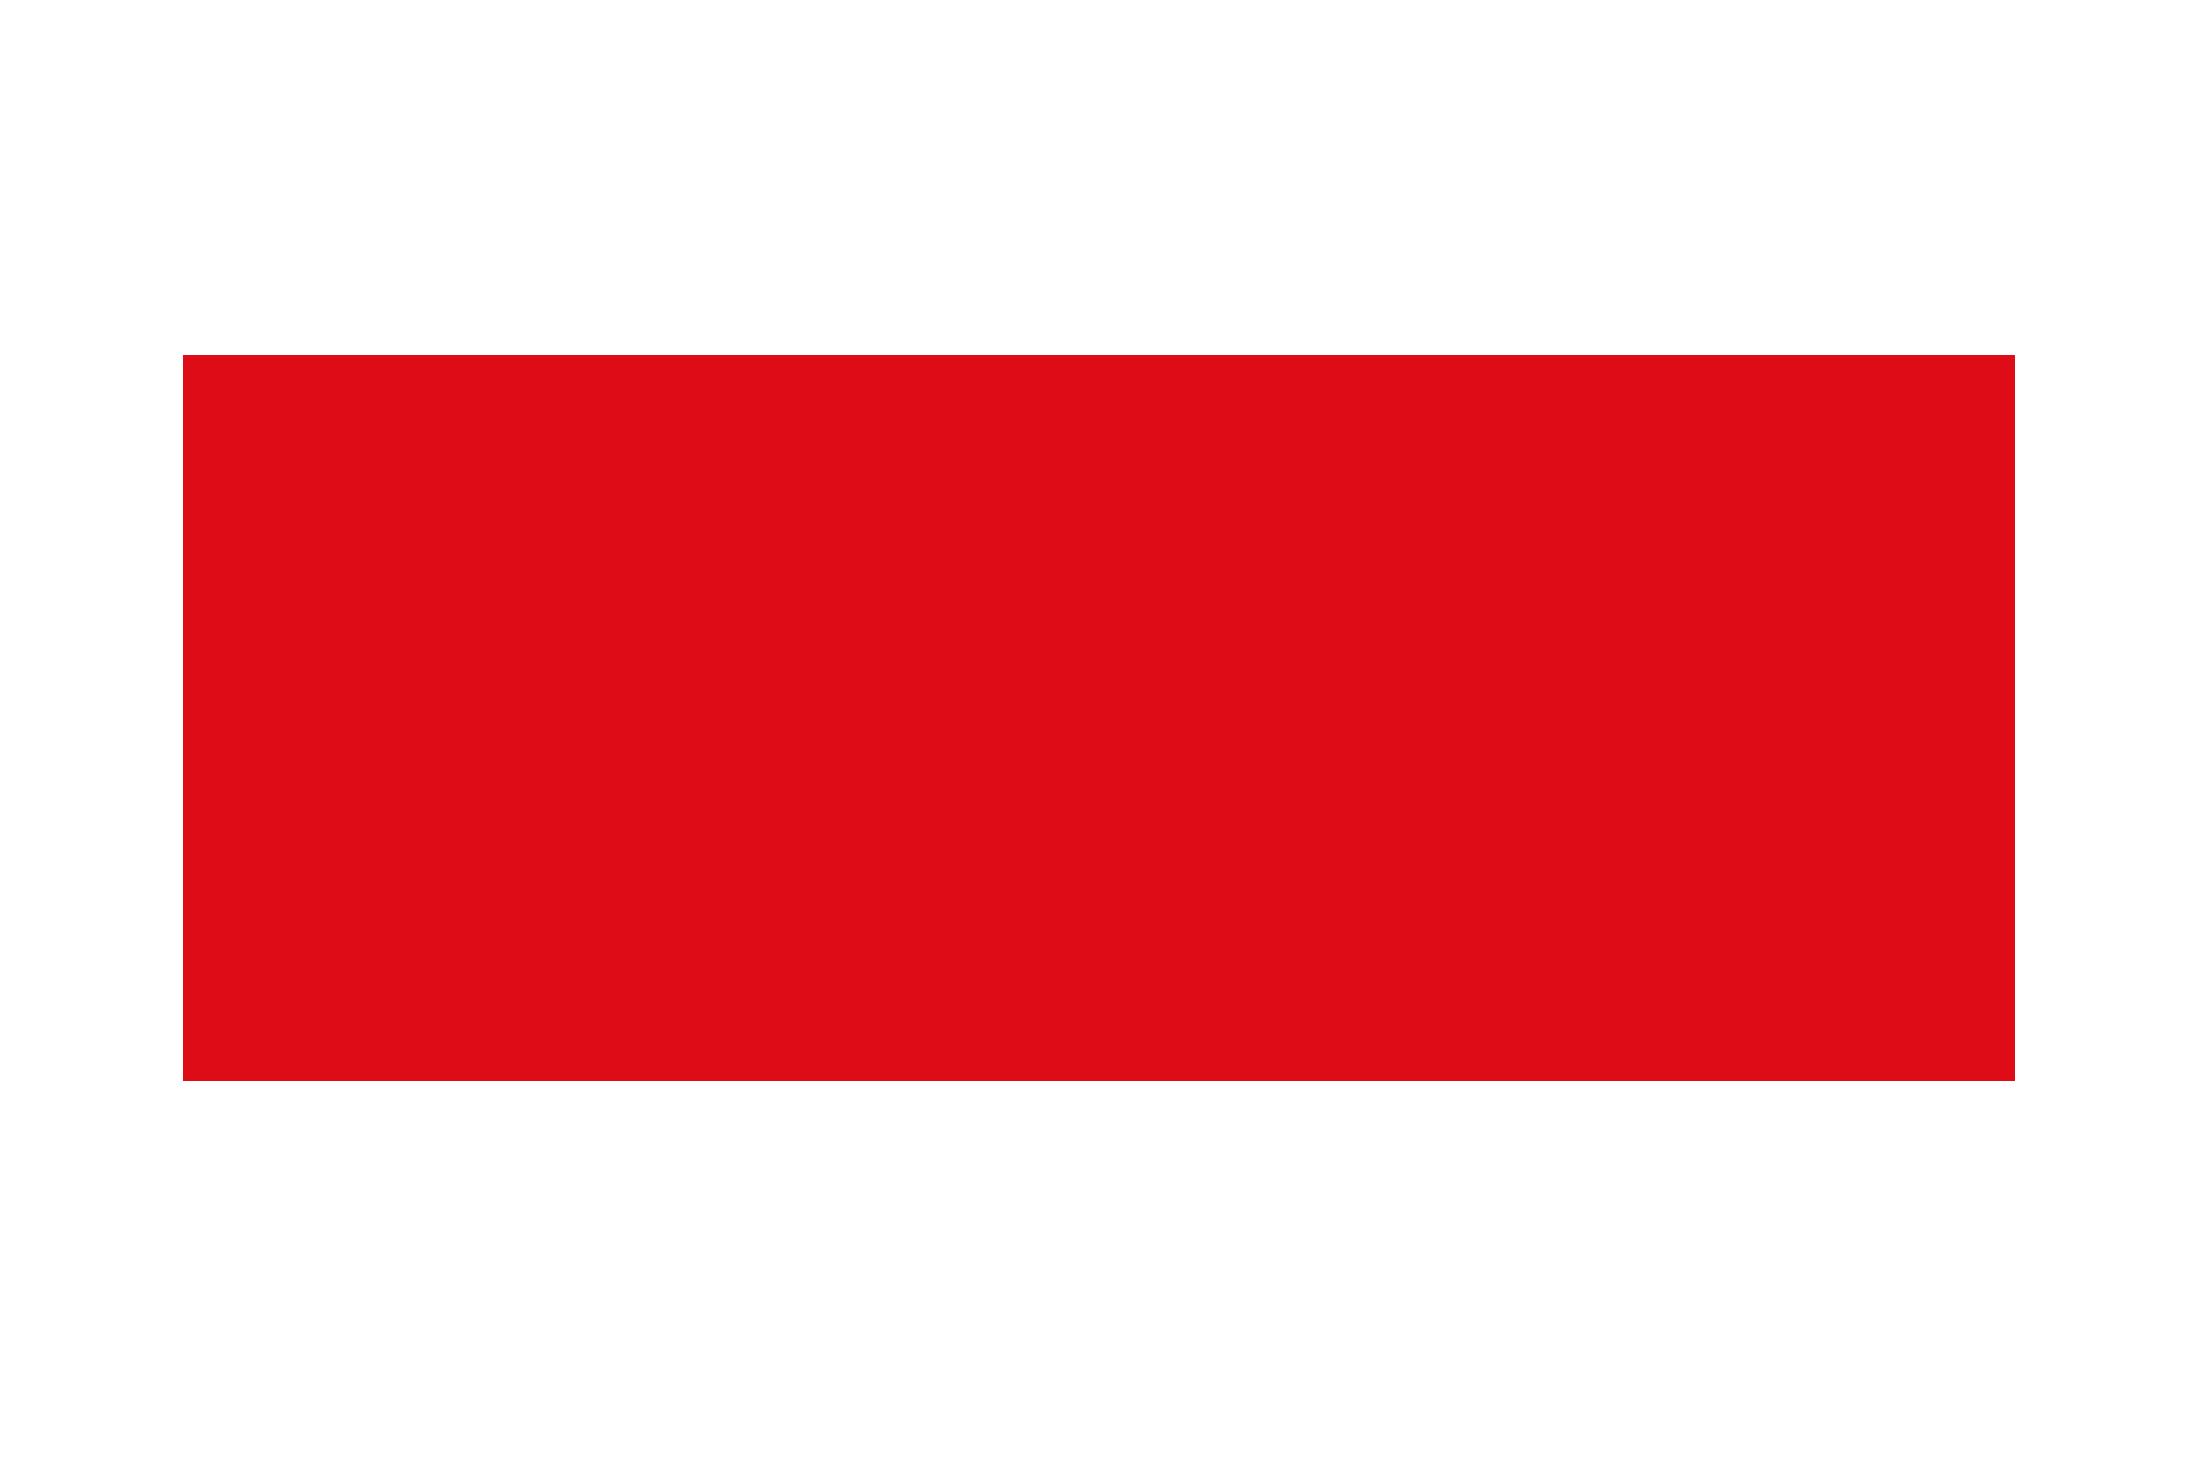 Grunge www label PSD